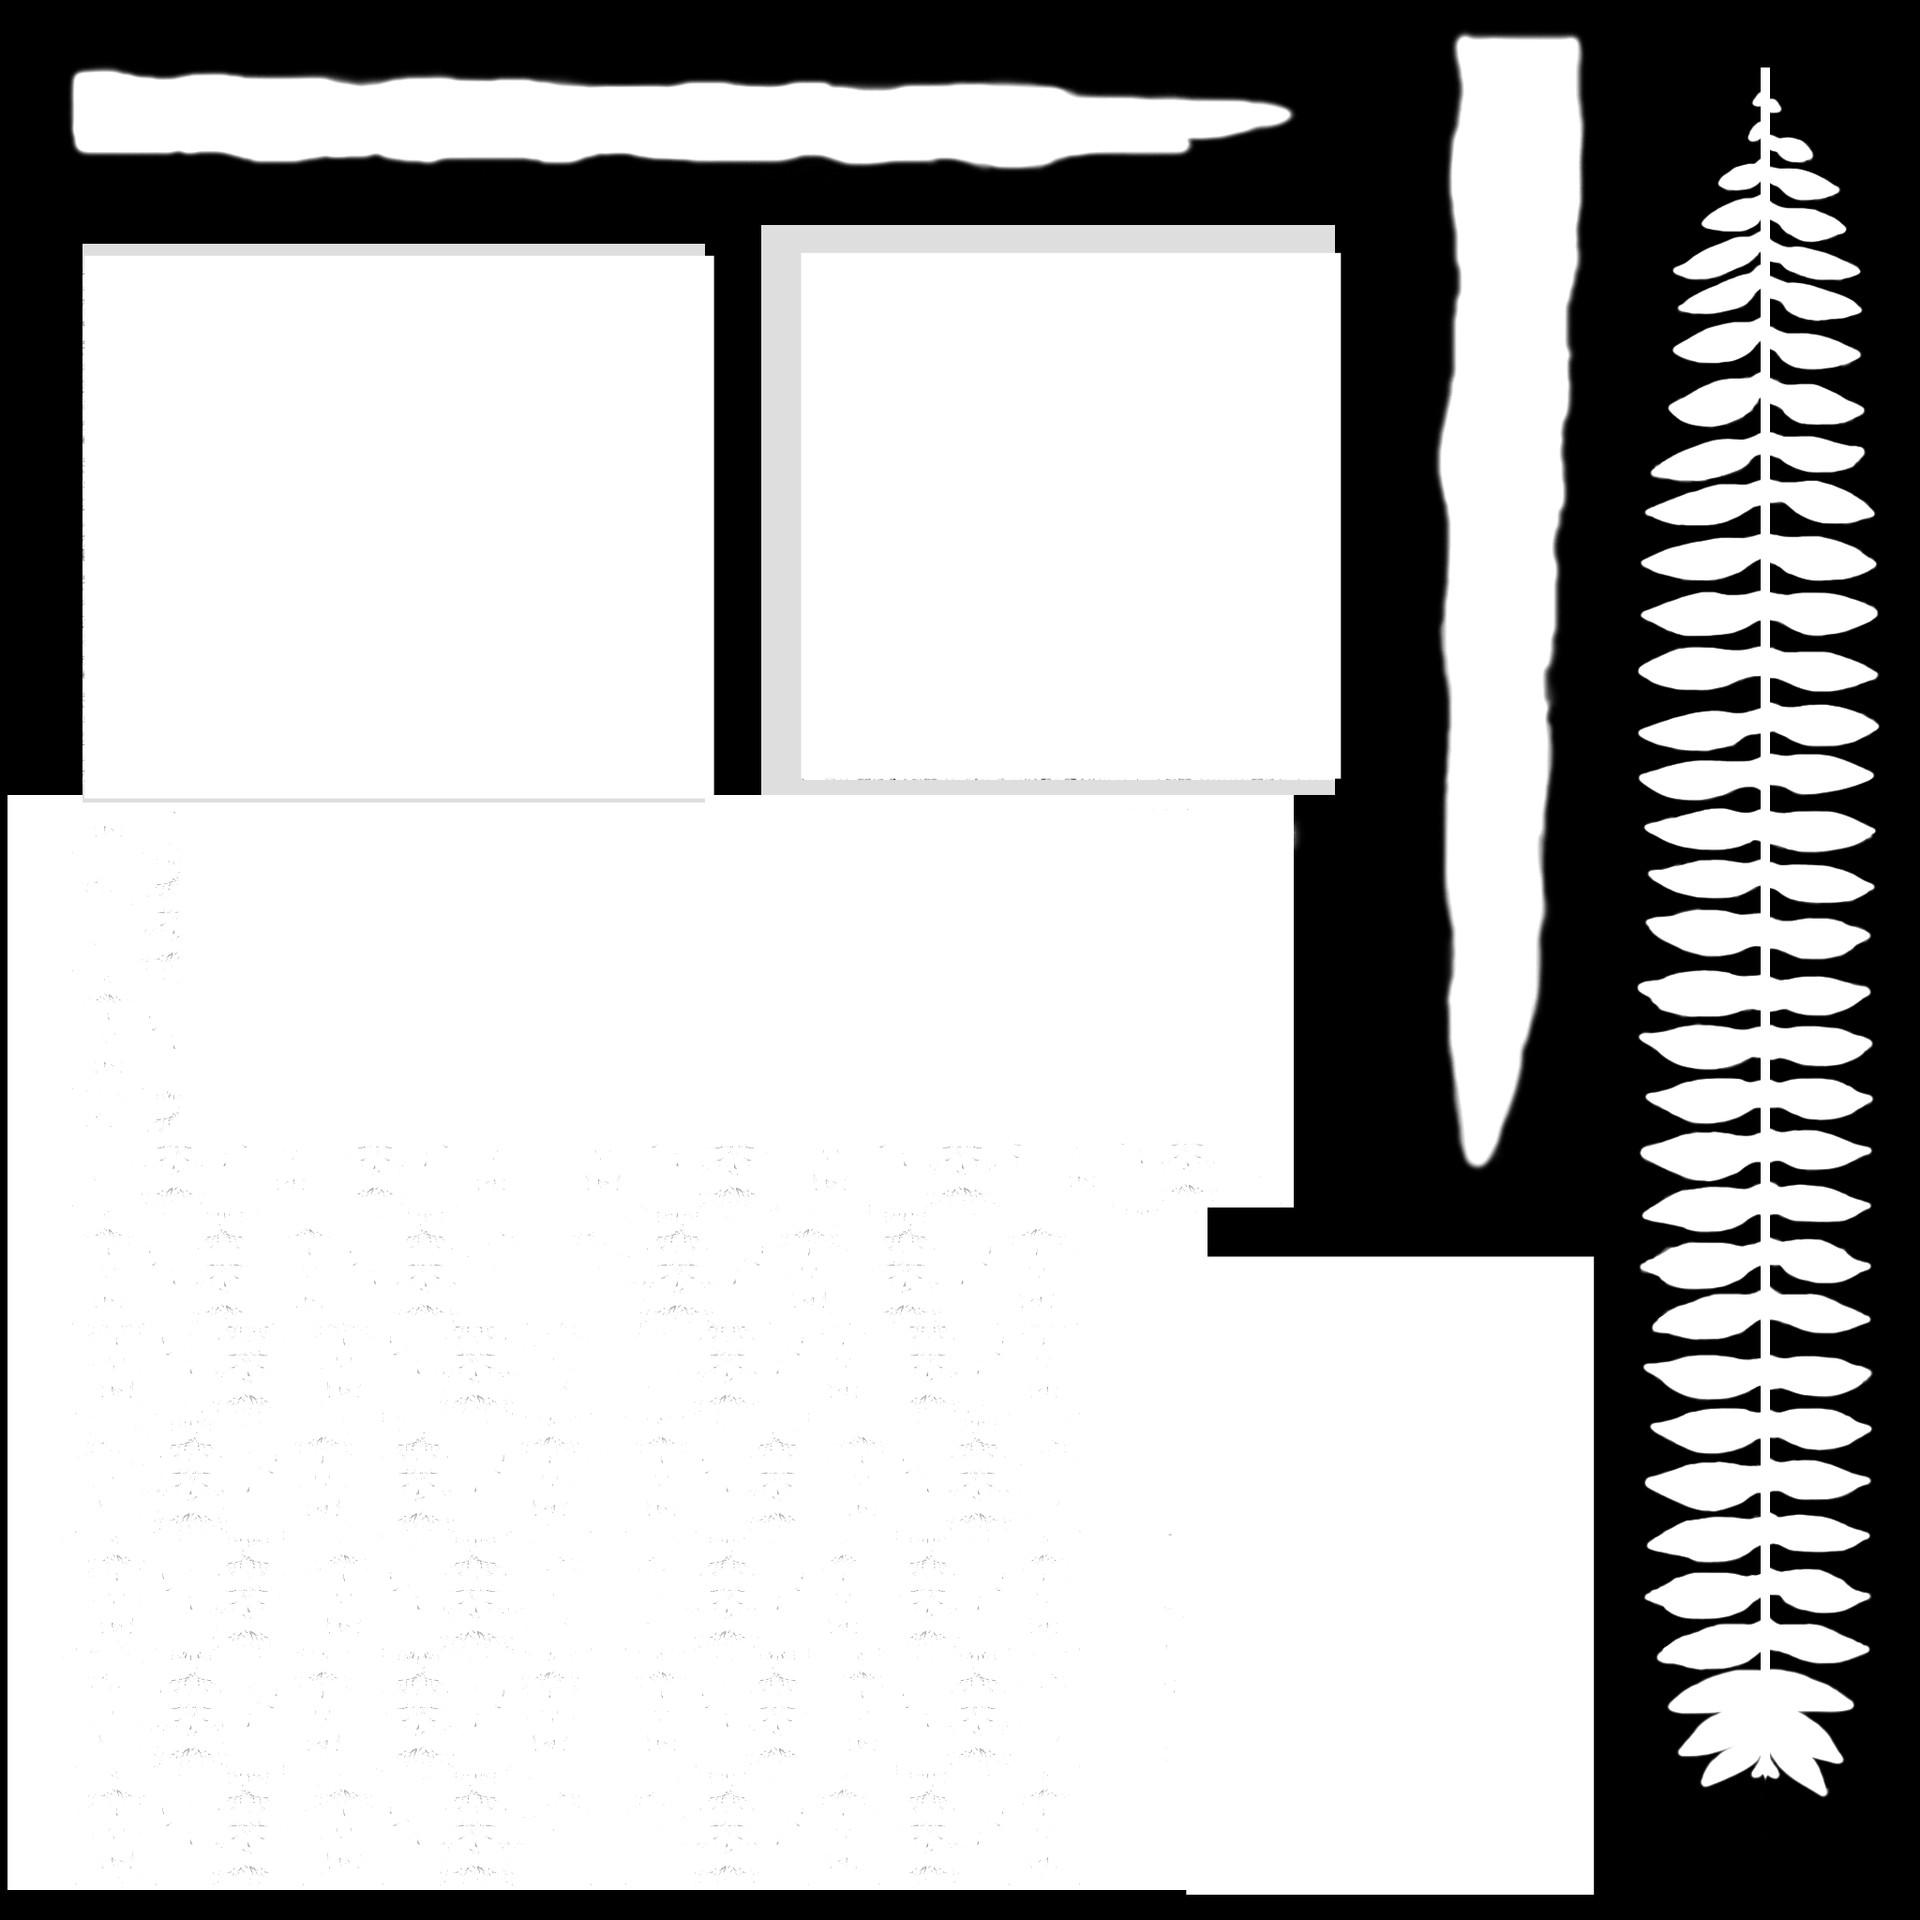 James skinner palmtree opacity